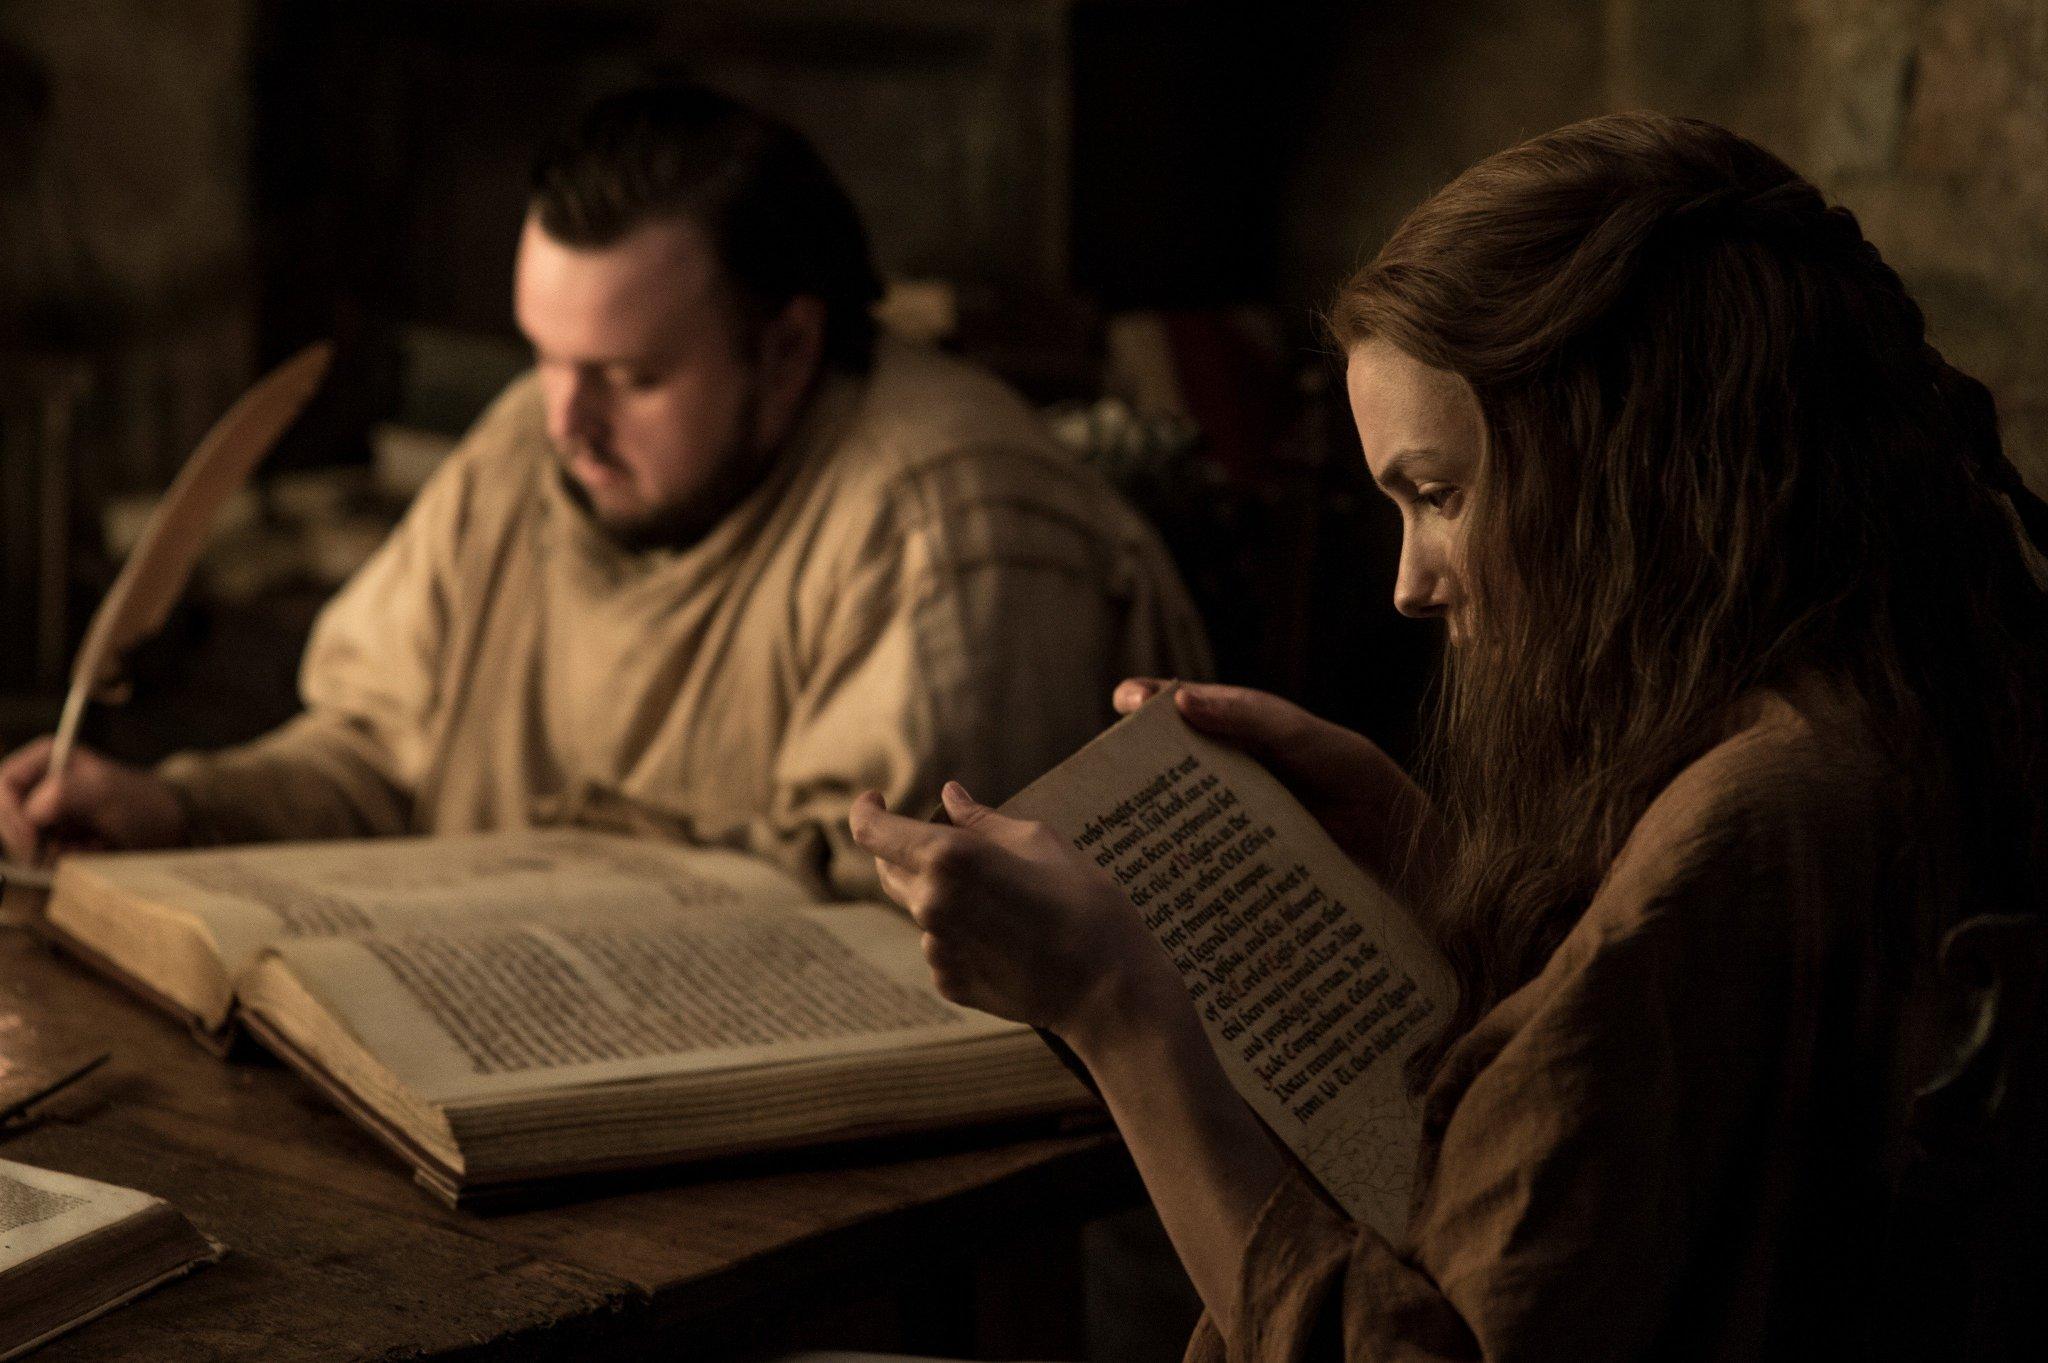 John Bradley as Samwell Tarly and Hannah Murray as Gilly. #GoTS7 #GameofThrones (Photo Helen: Sloan/HBO) https://t.co/RtPyaQd7yo